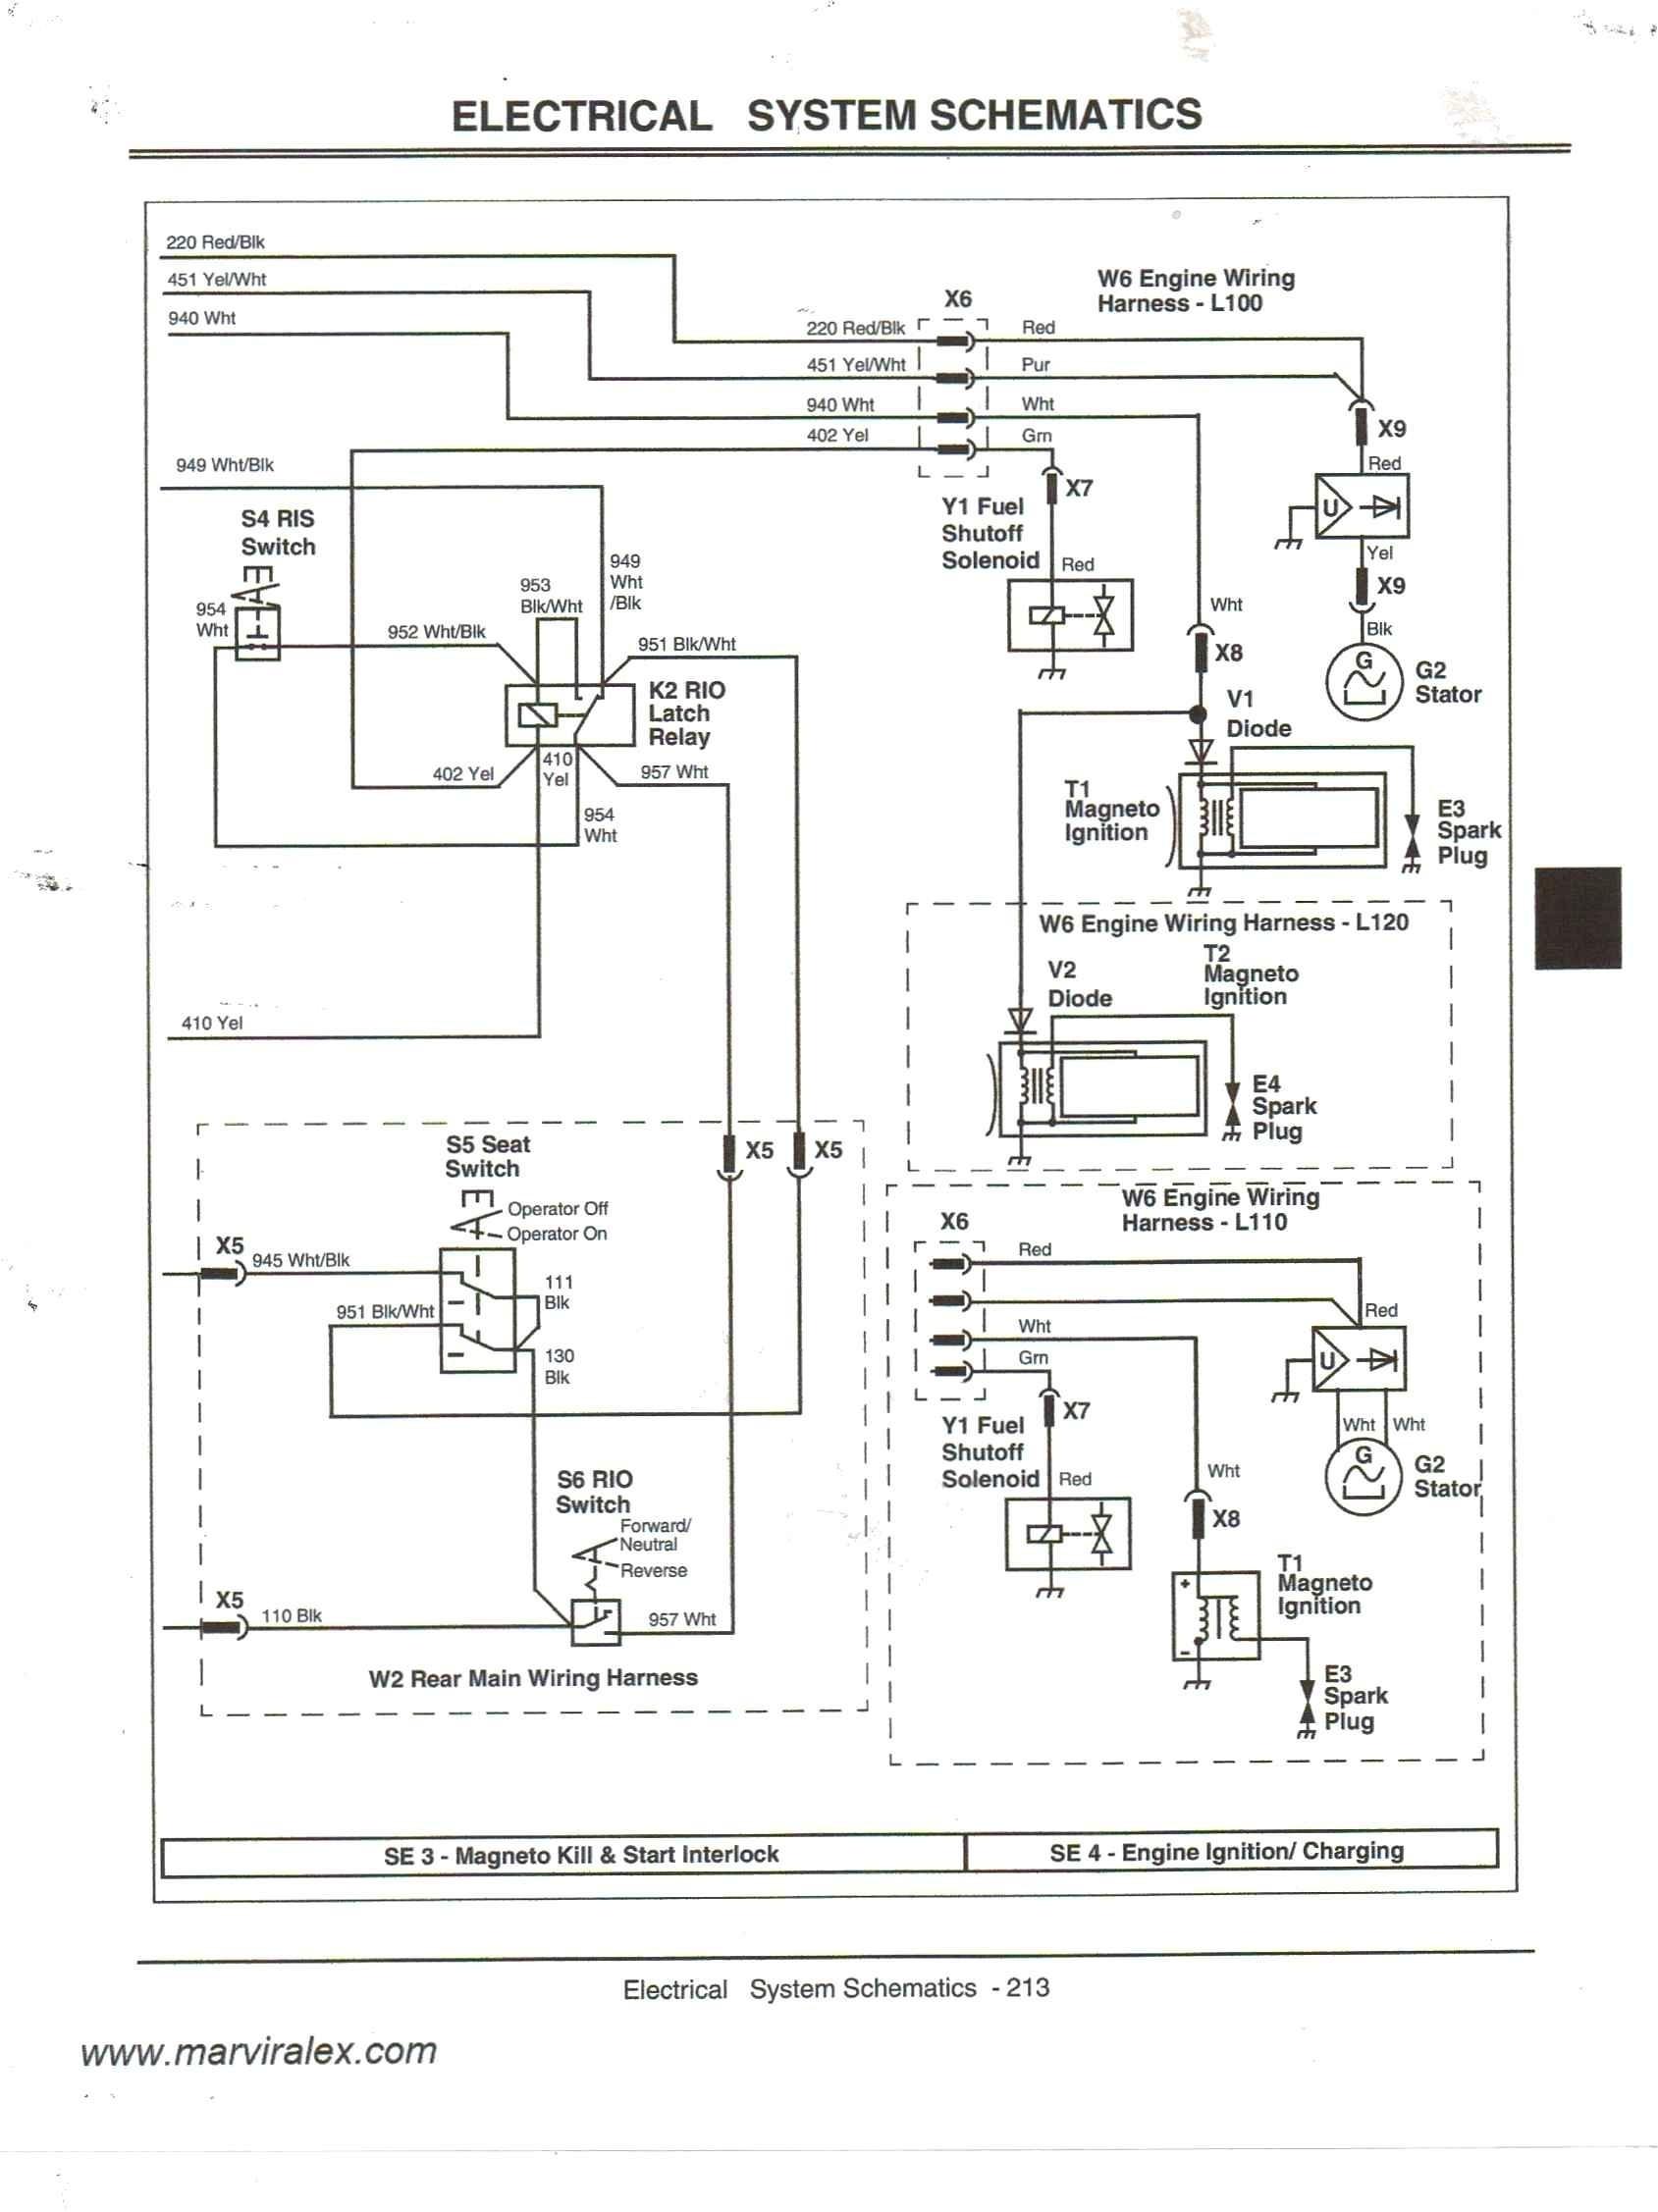 hight resolution of jd 410 engine wiring diagram wiring diagrams wni john deere 410 wiring diagram